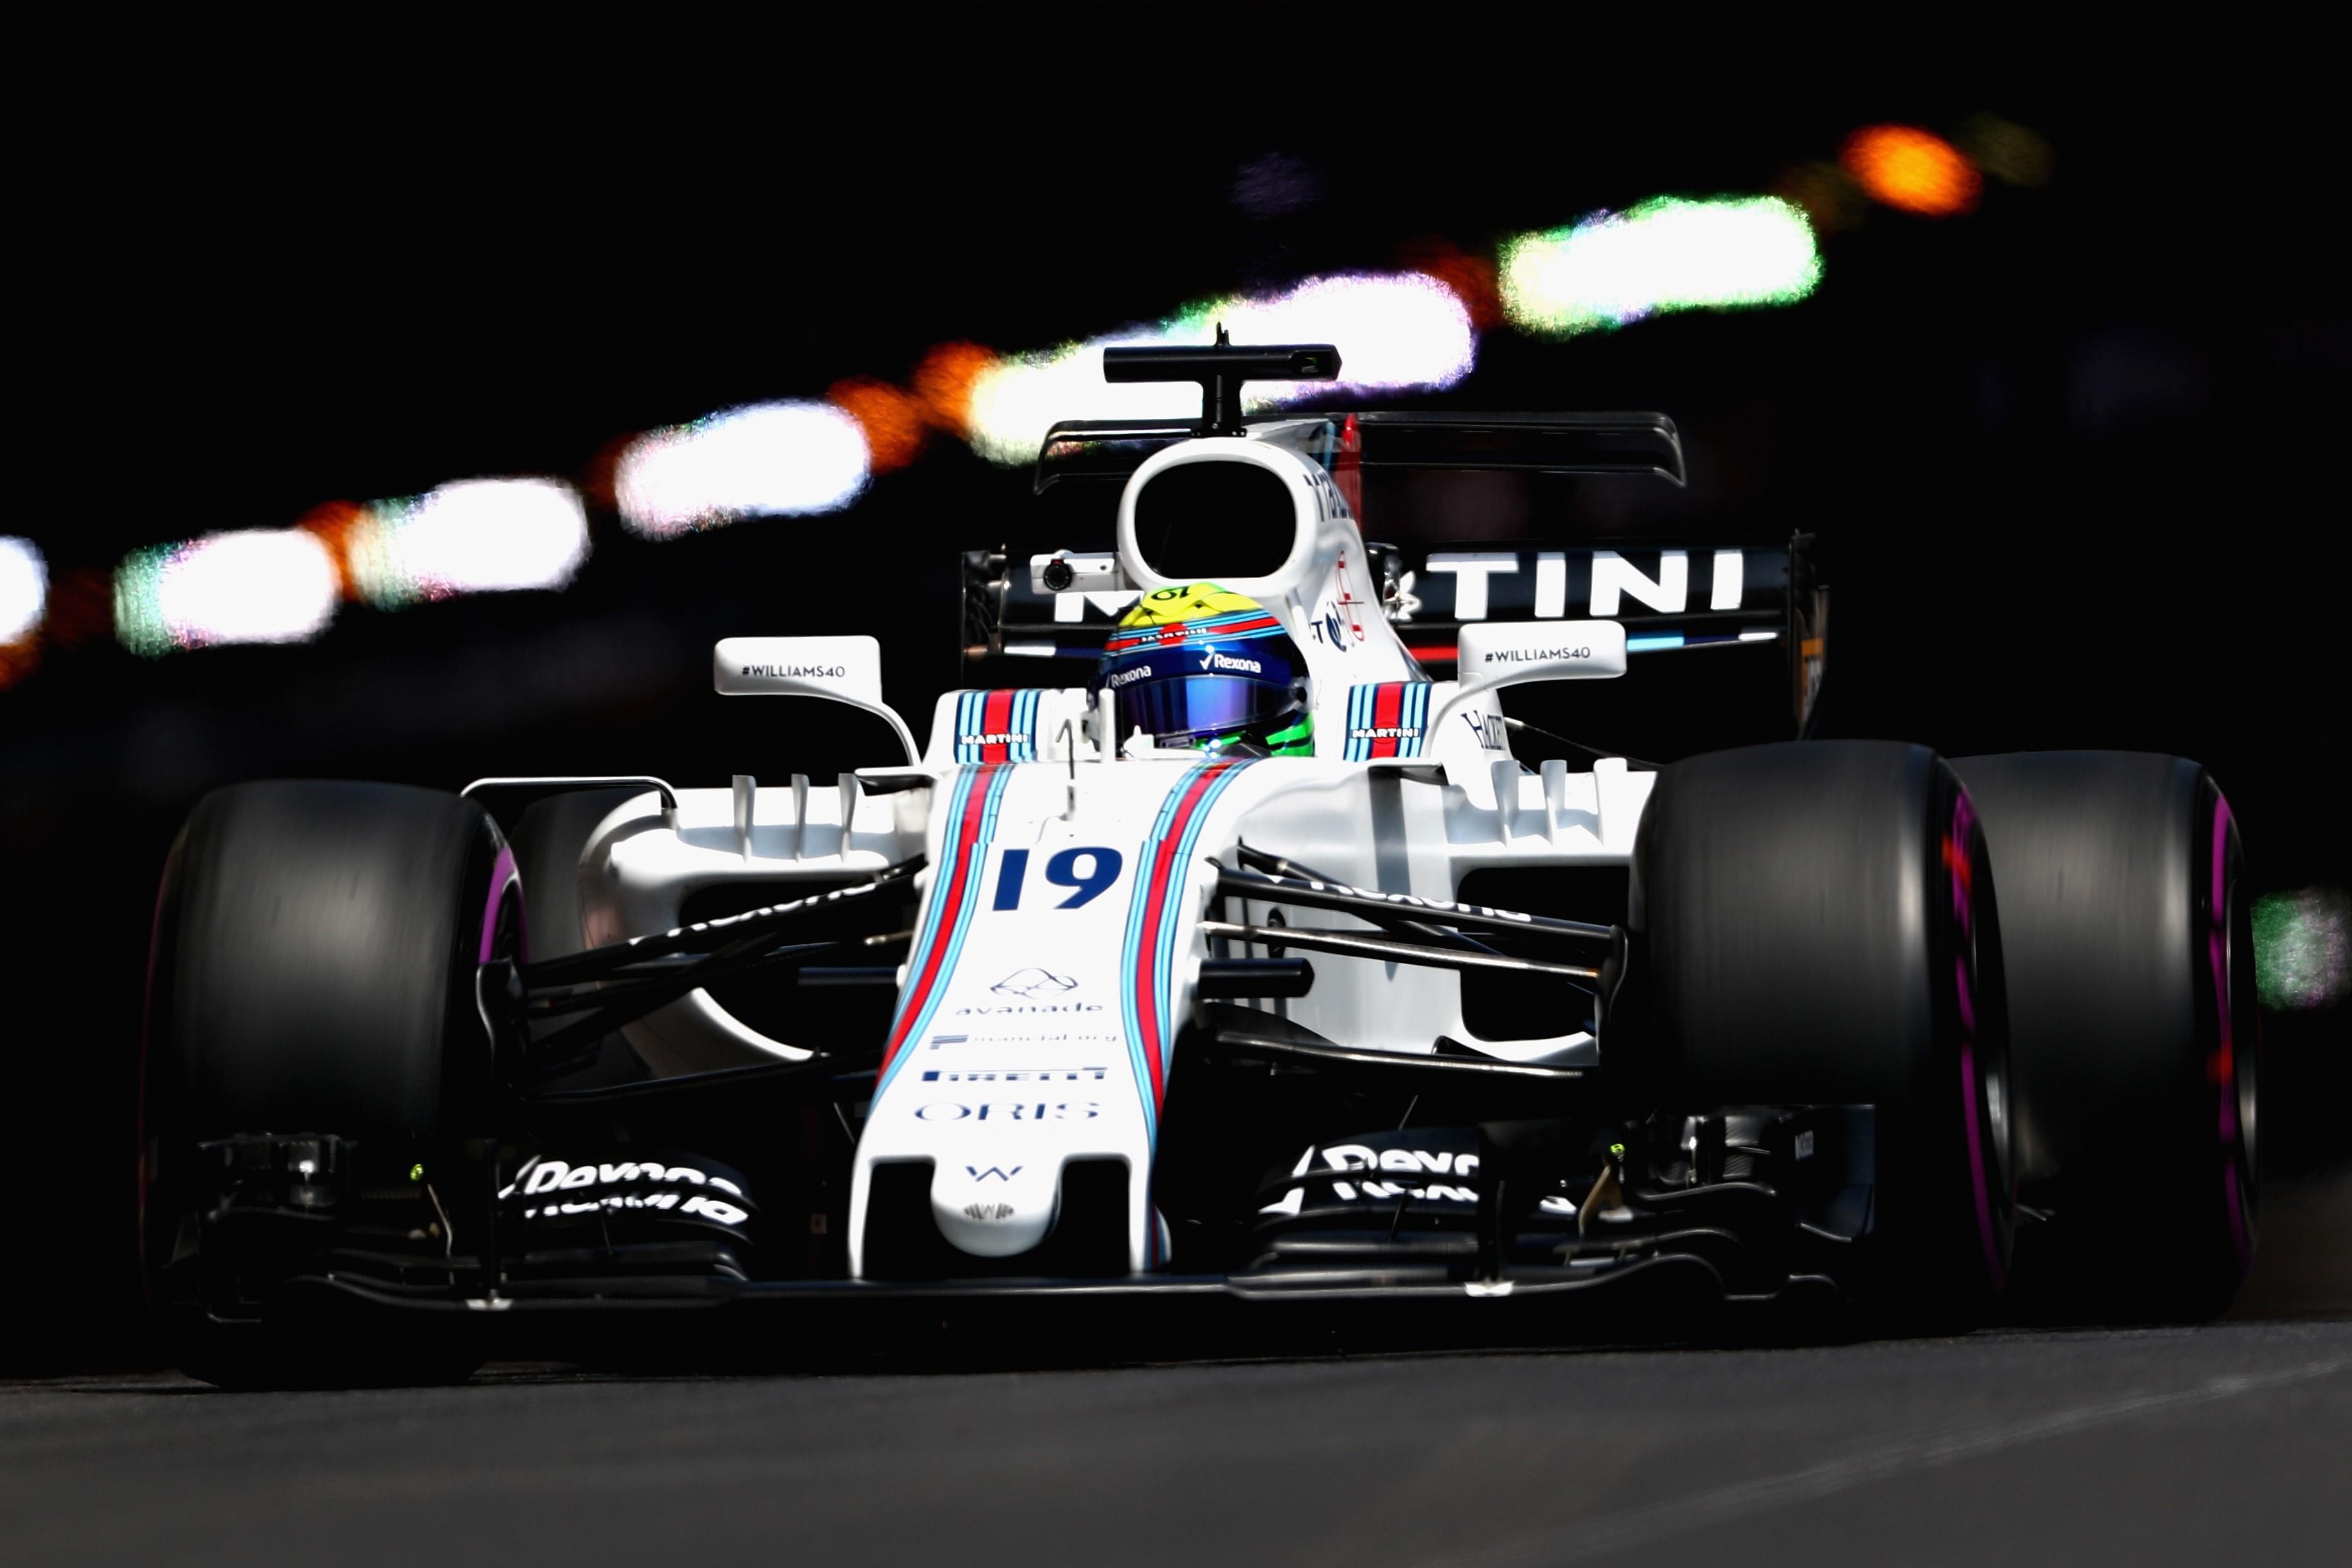 Felipe Massa (Williams) au Grand Prix de Monaco 2017